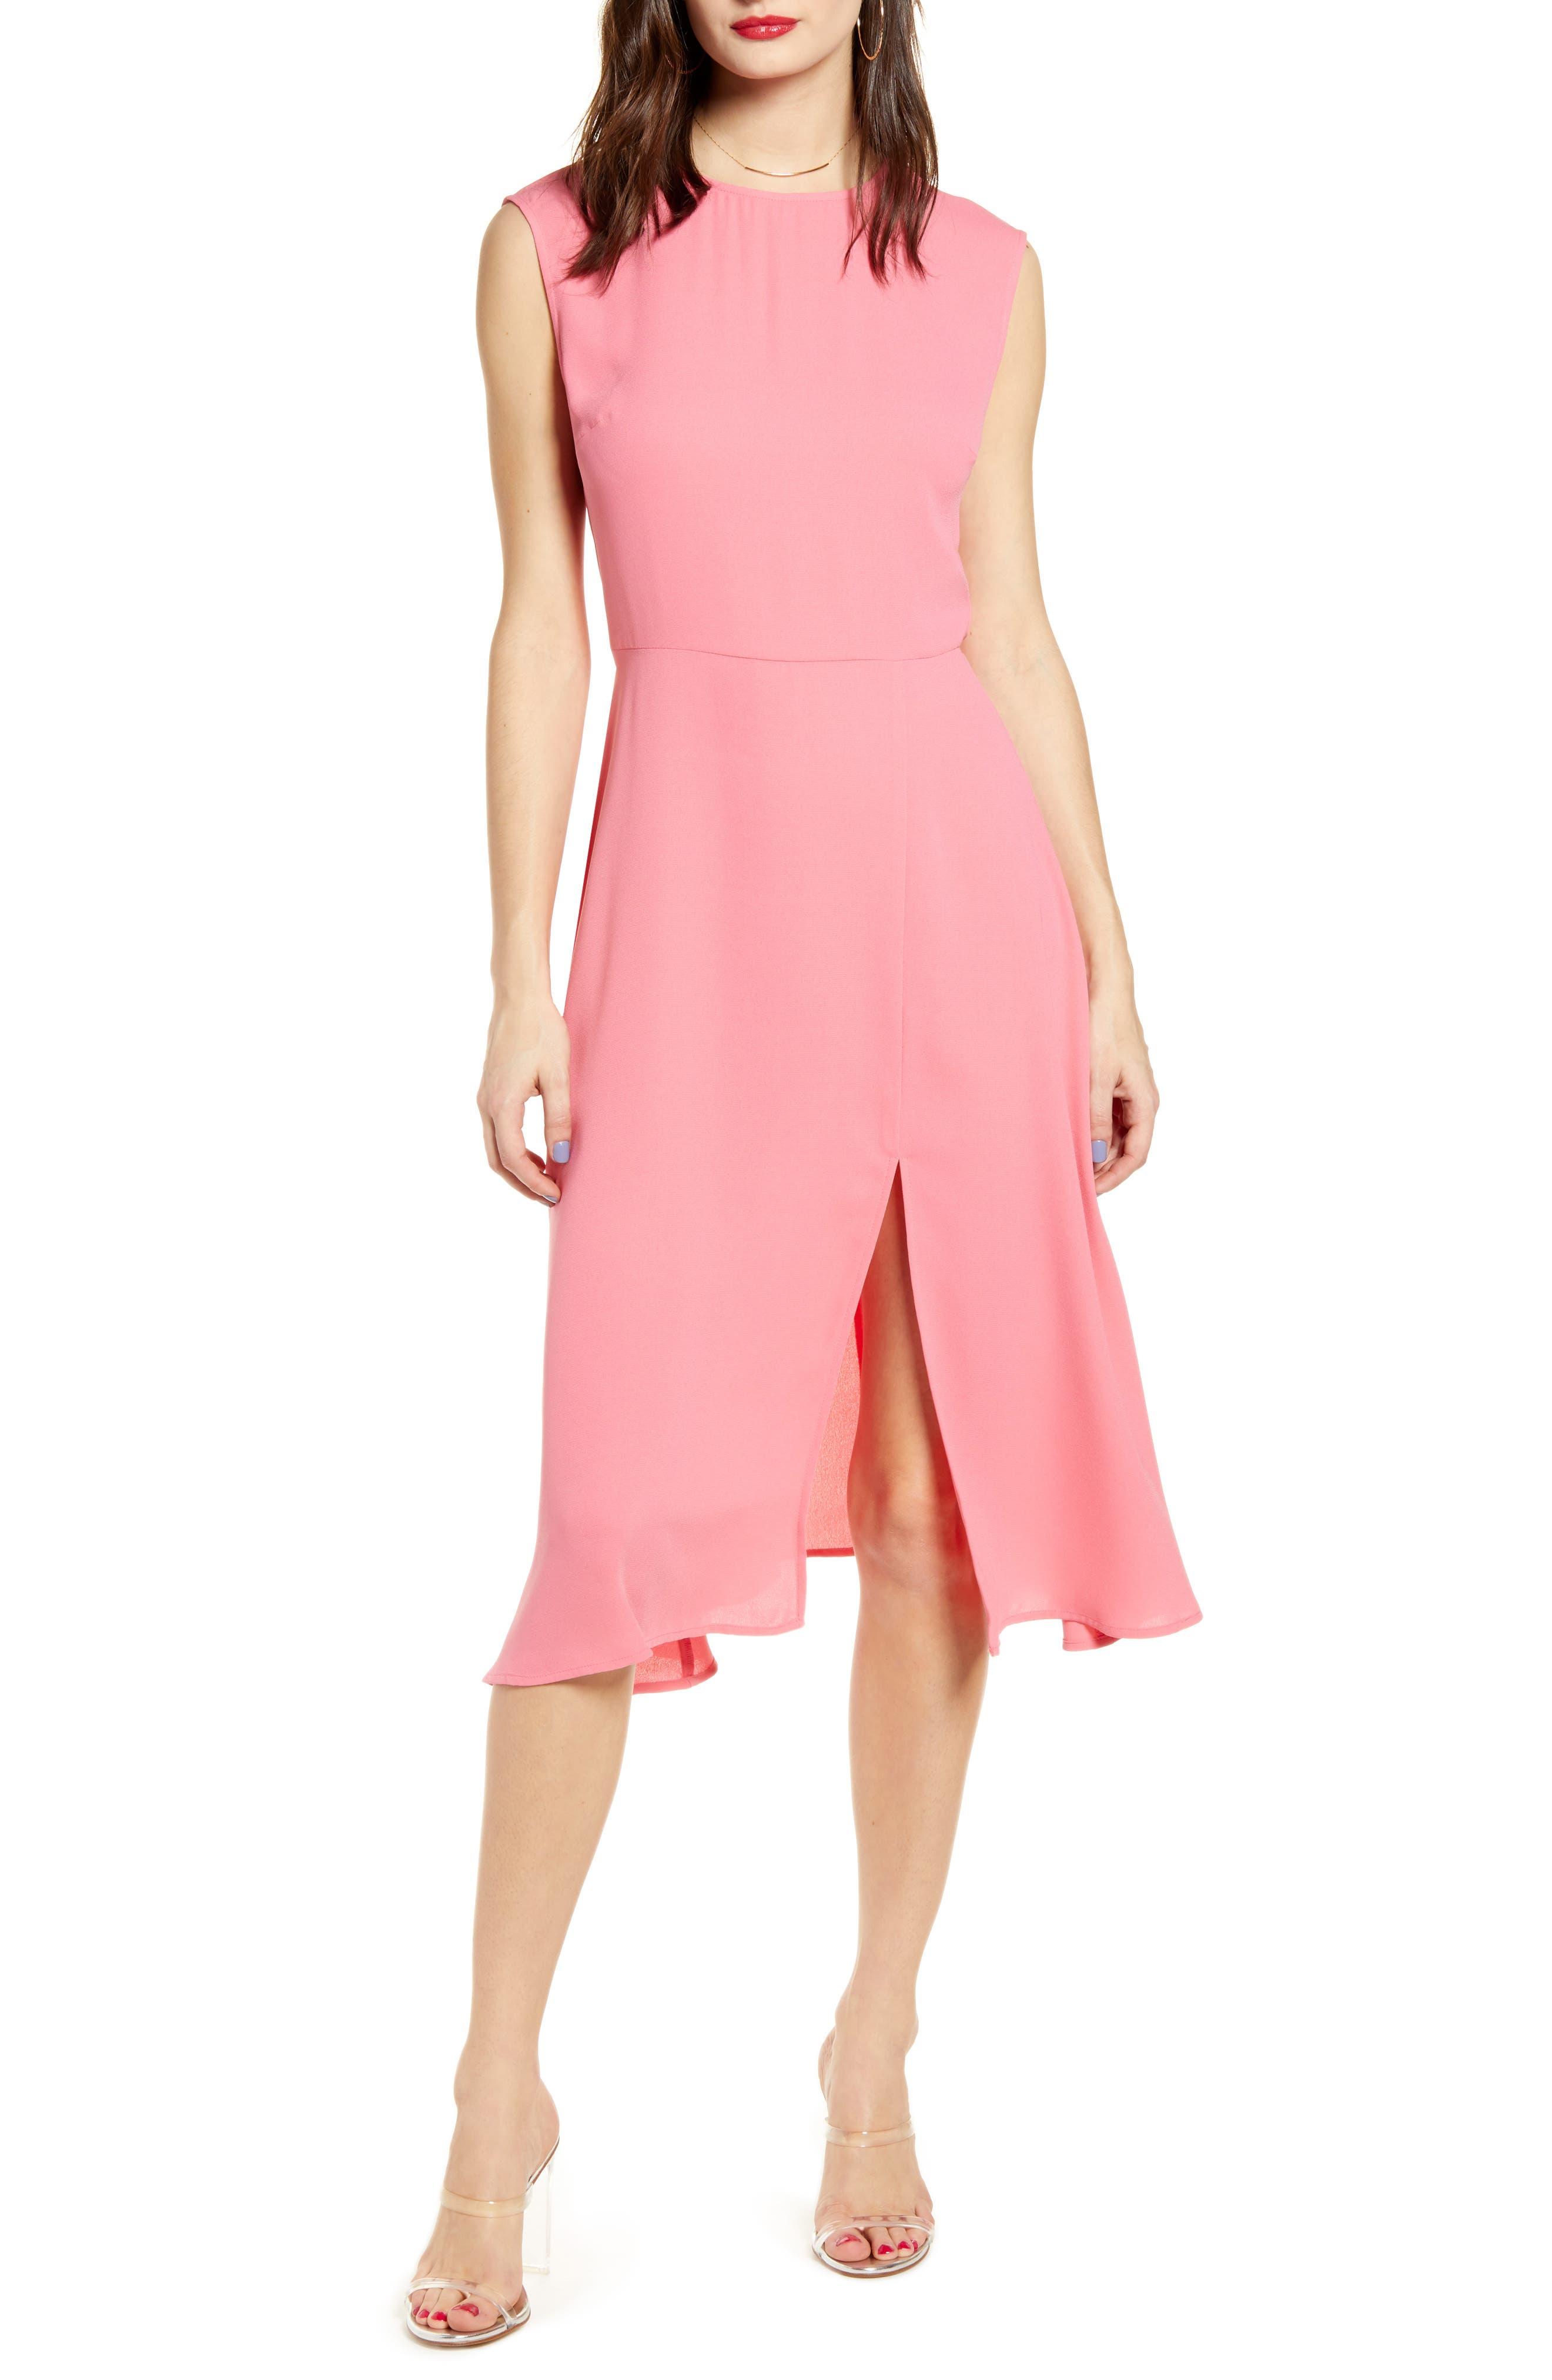 LEITH Chic Midi Dress, Main, color, PINK LEMONADE